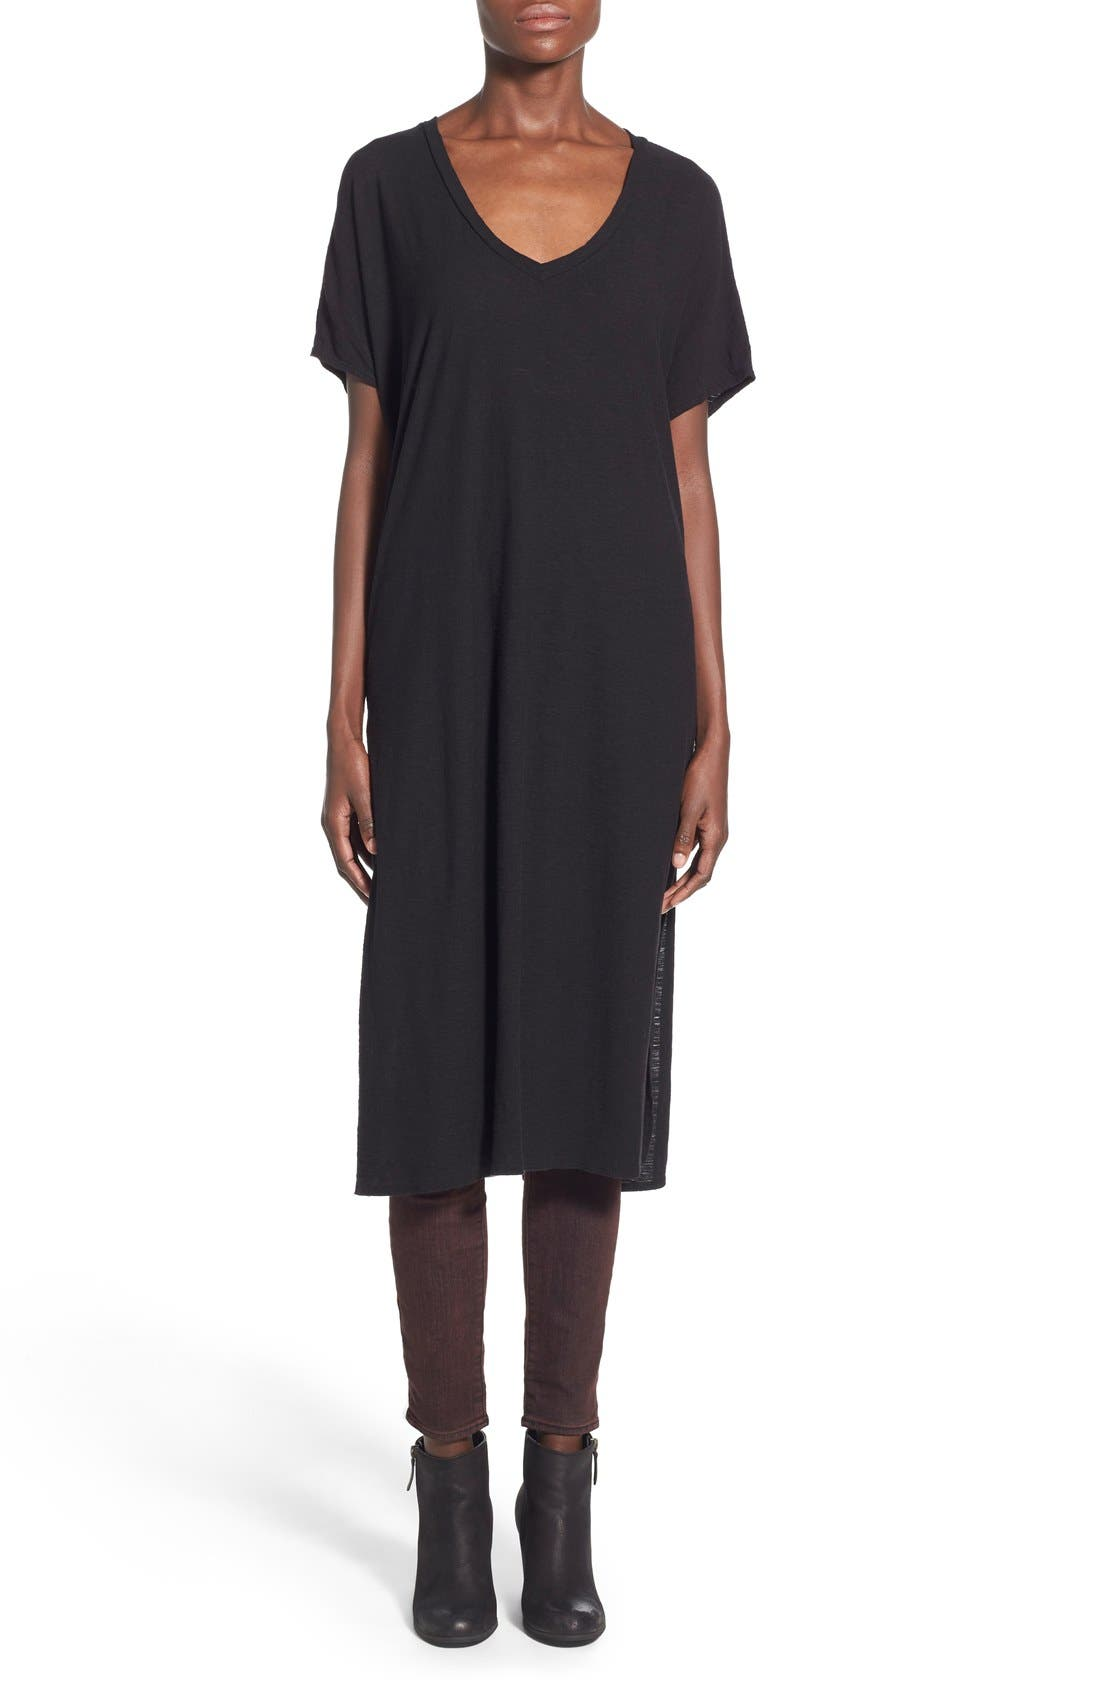 Main Image - Michelle by Comune 'Hayward' V-Neck T-Shirt Dress